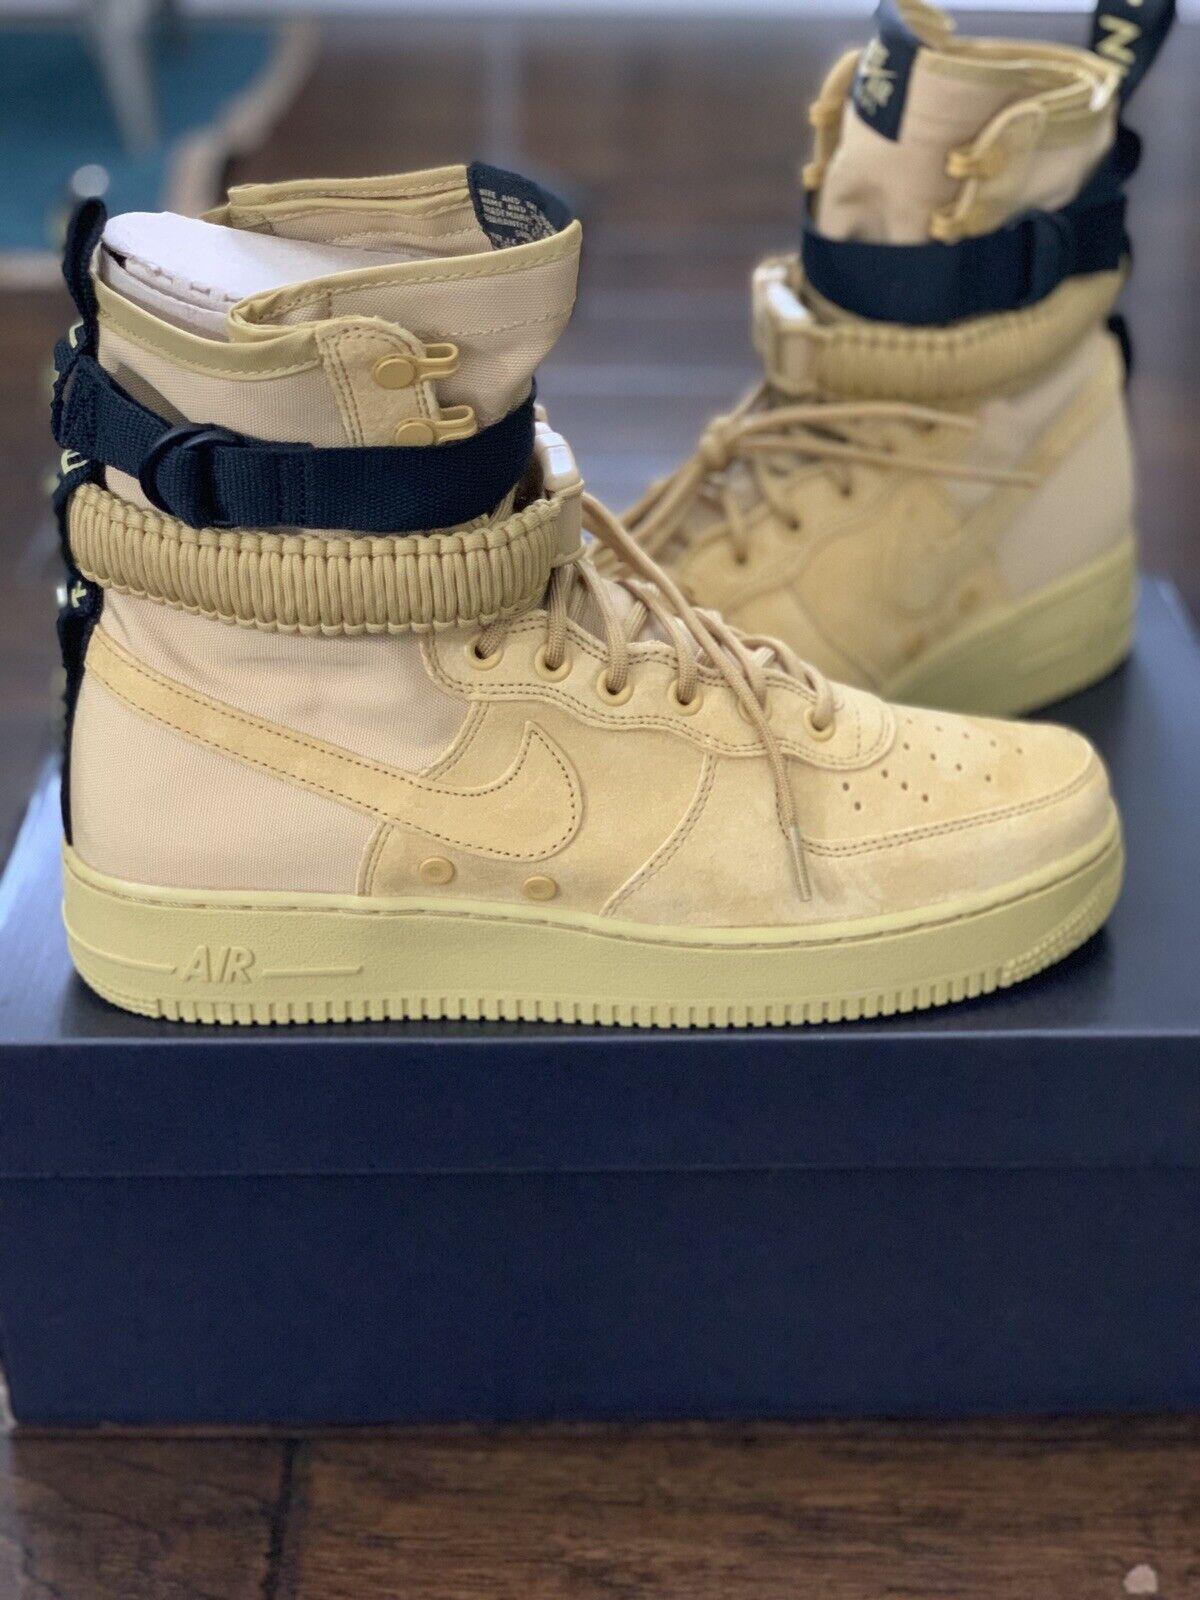 Nike Air Force 1 Mens 10.5 Club Gold High Top Turnschuhe